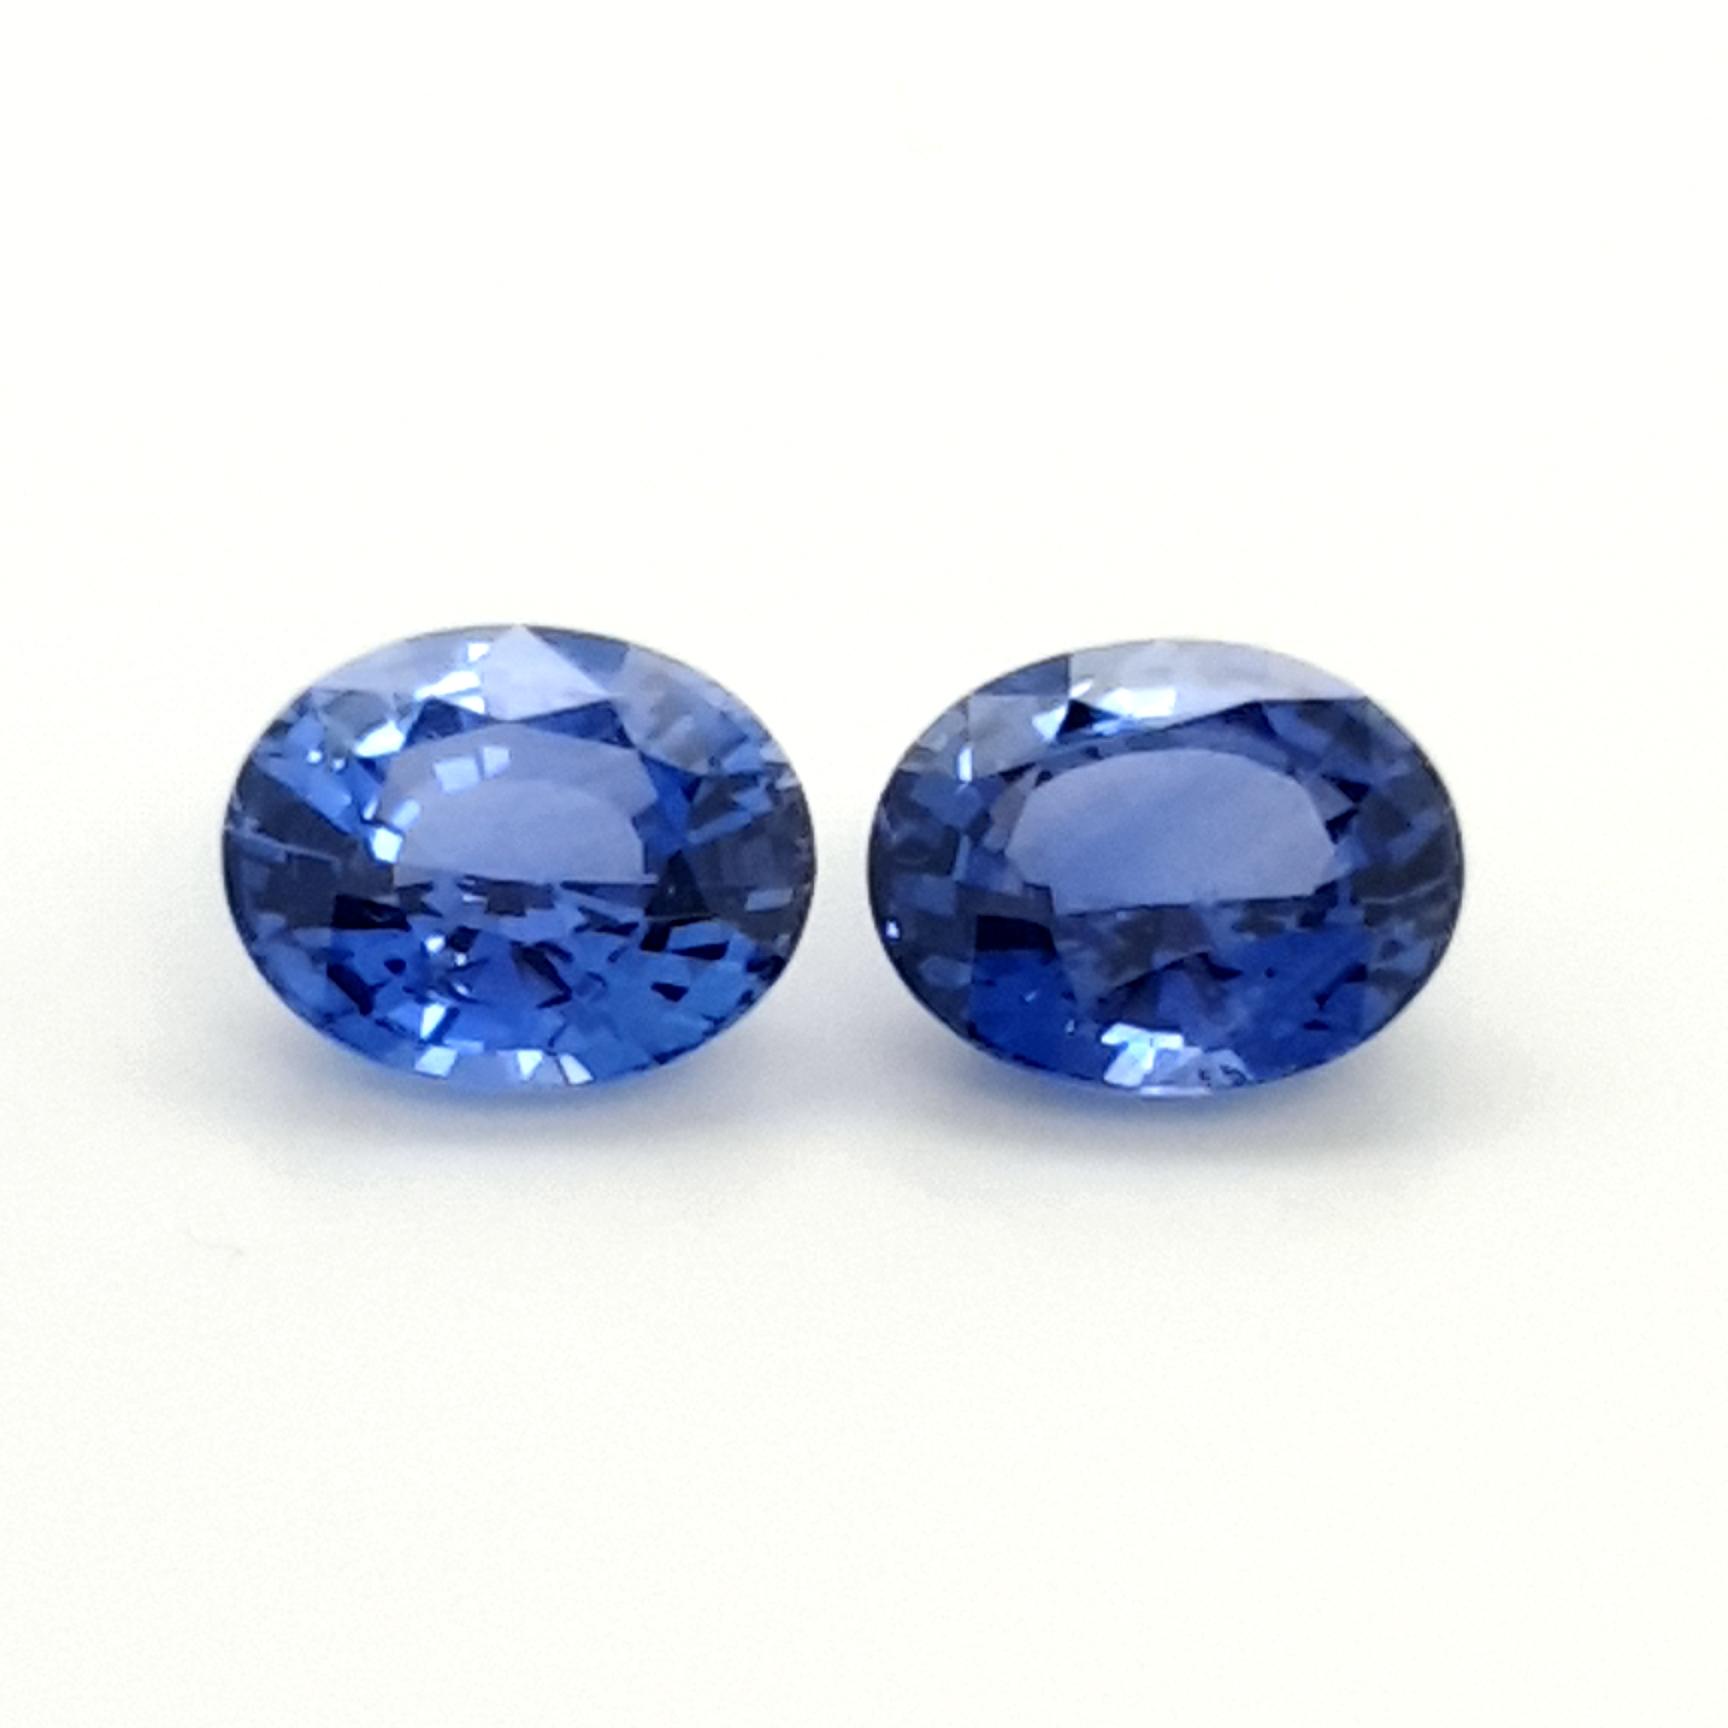 8,30ct. Pair Sapphire Ceylon cert. SAK15D2 ClaudiaHamann__2021-06-03-08-47-32